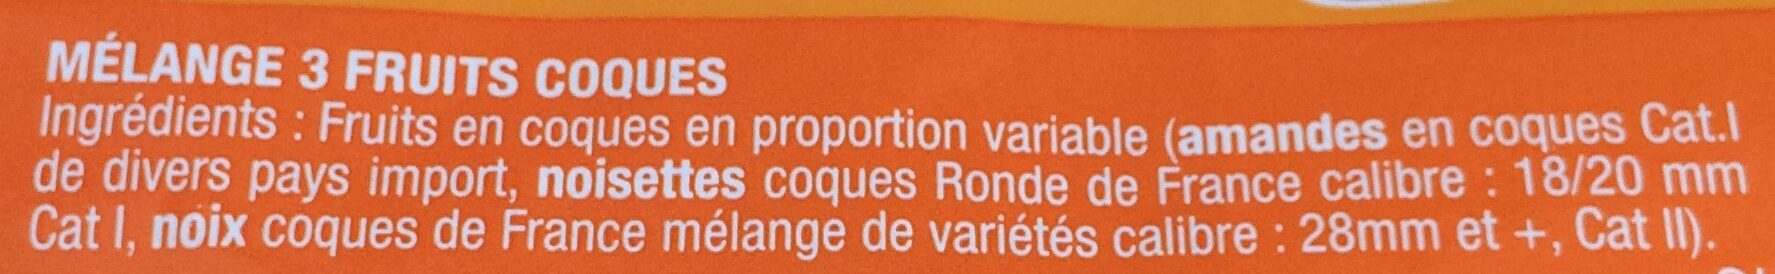 Melange 3 Coques - Ingrédients - fr